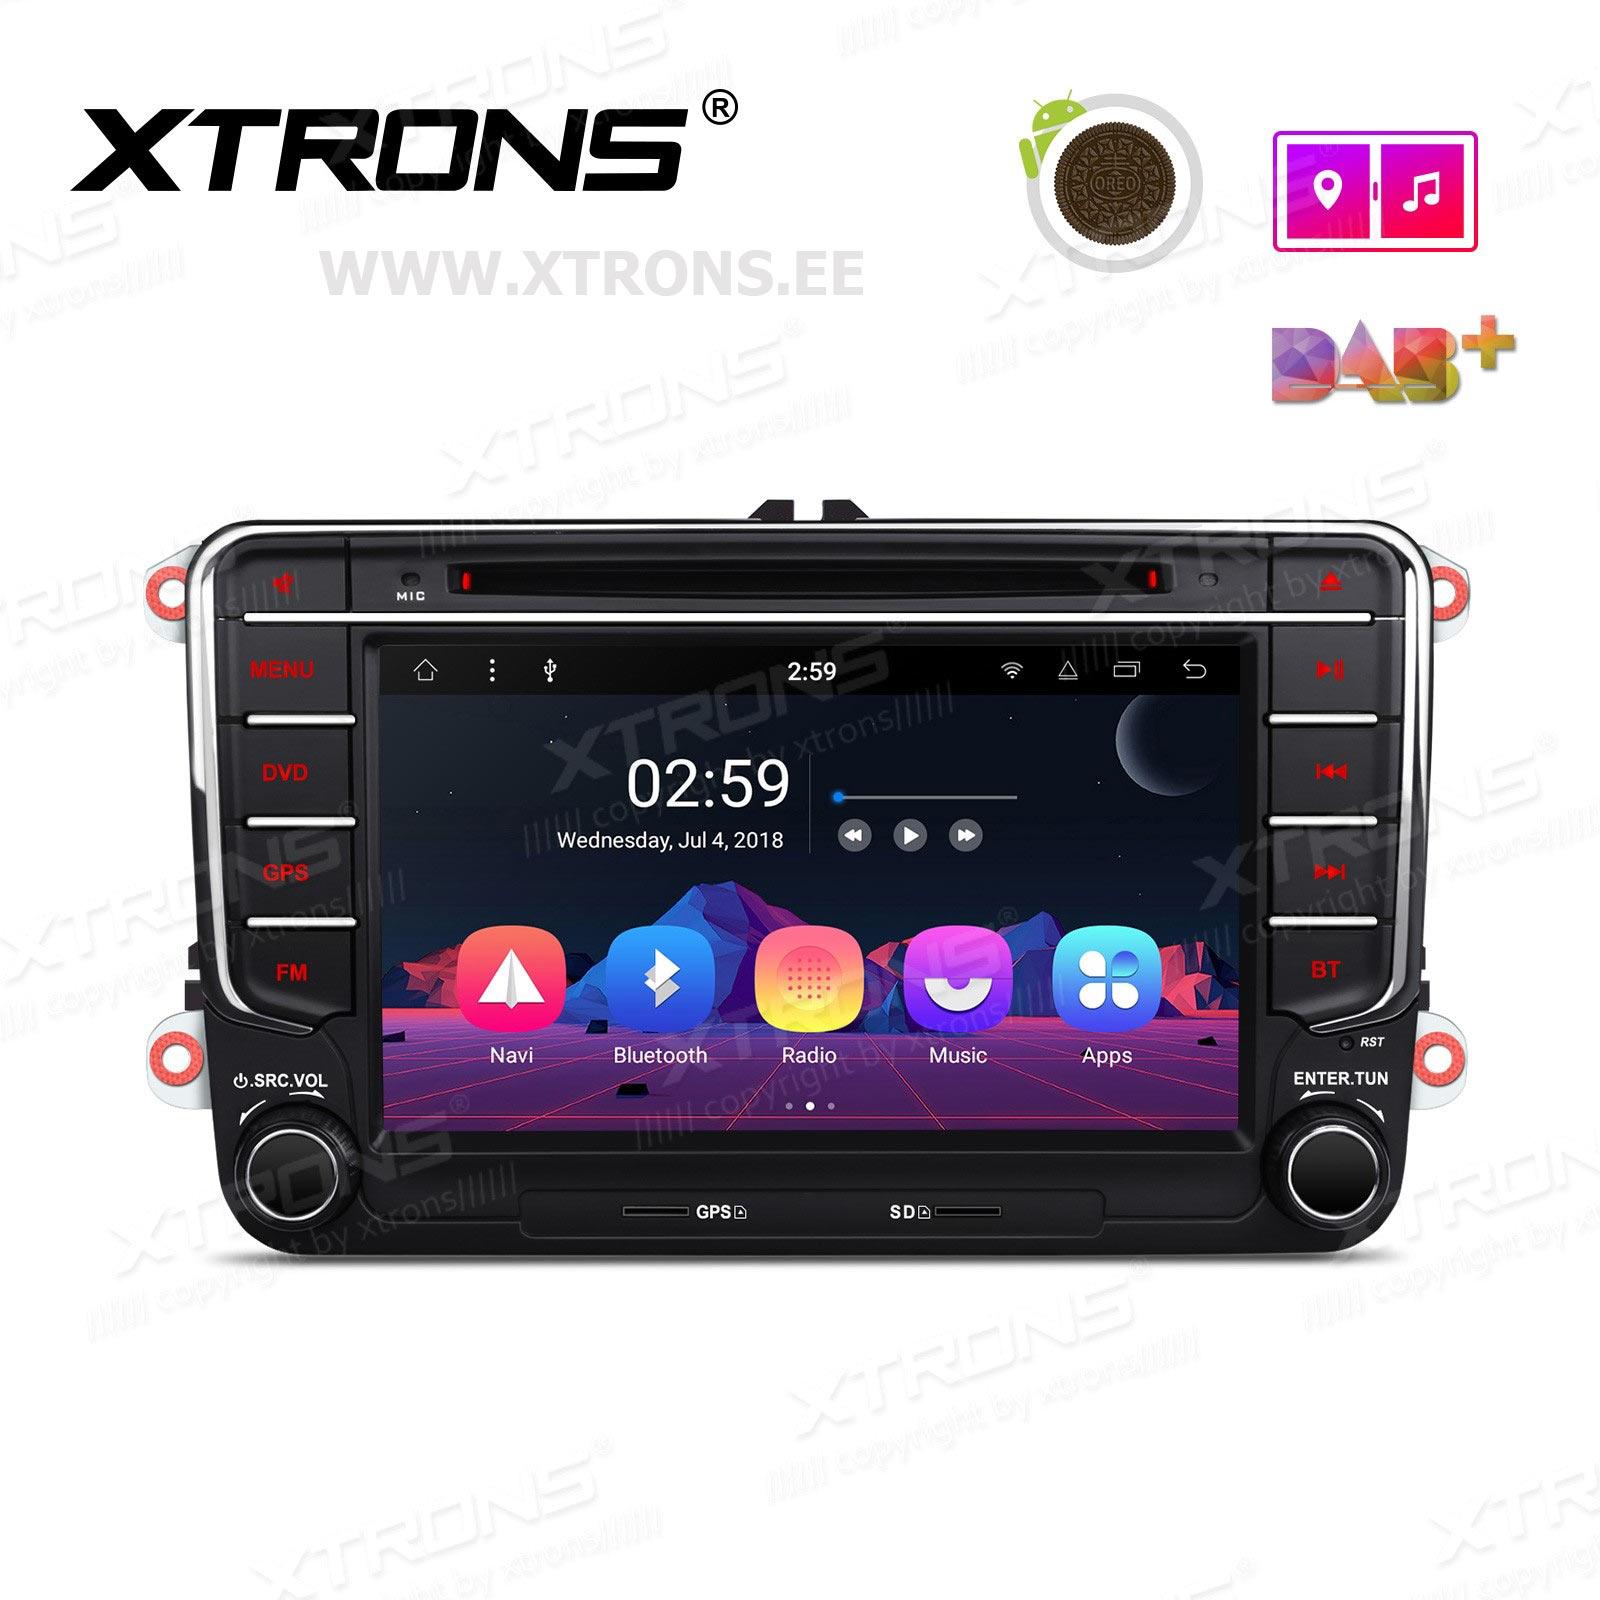 XTRONS PR78MTV